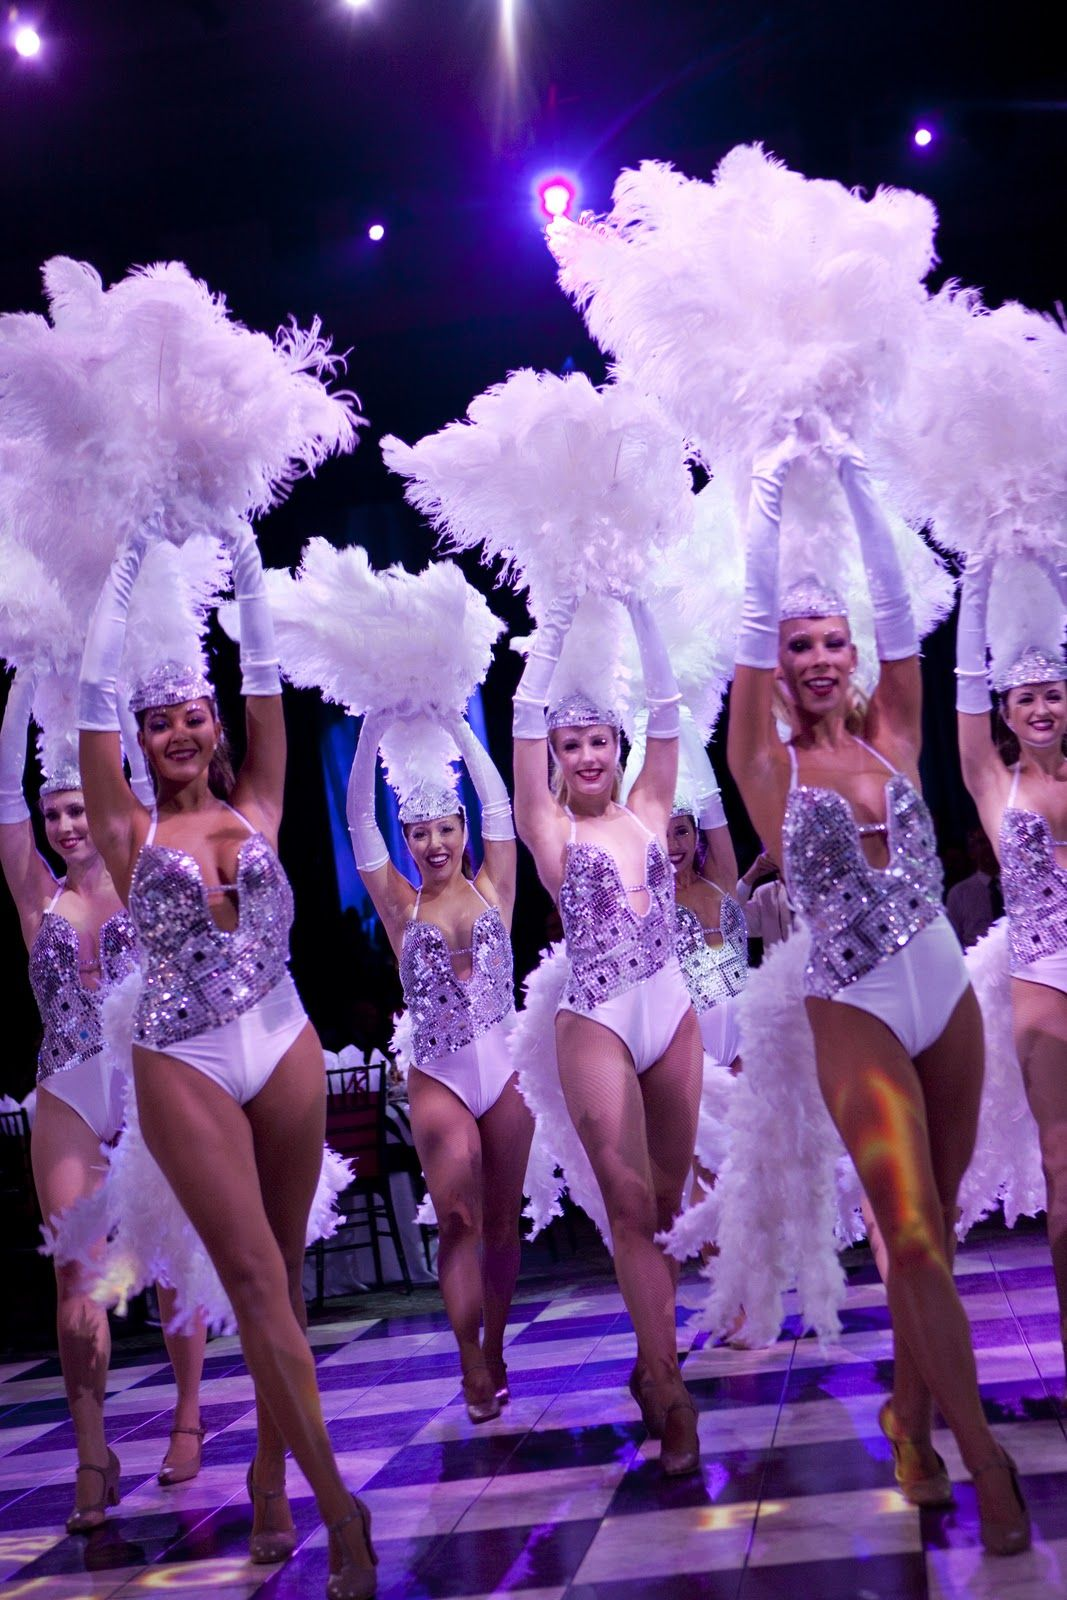 Las Vegas Style Showgirls for Las Vegas theme party.